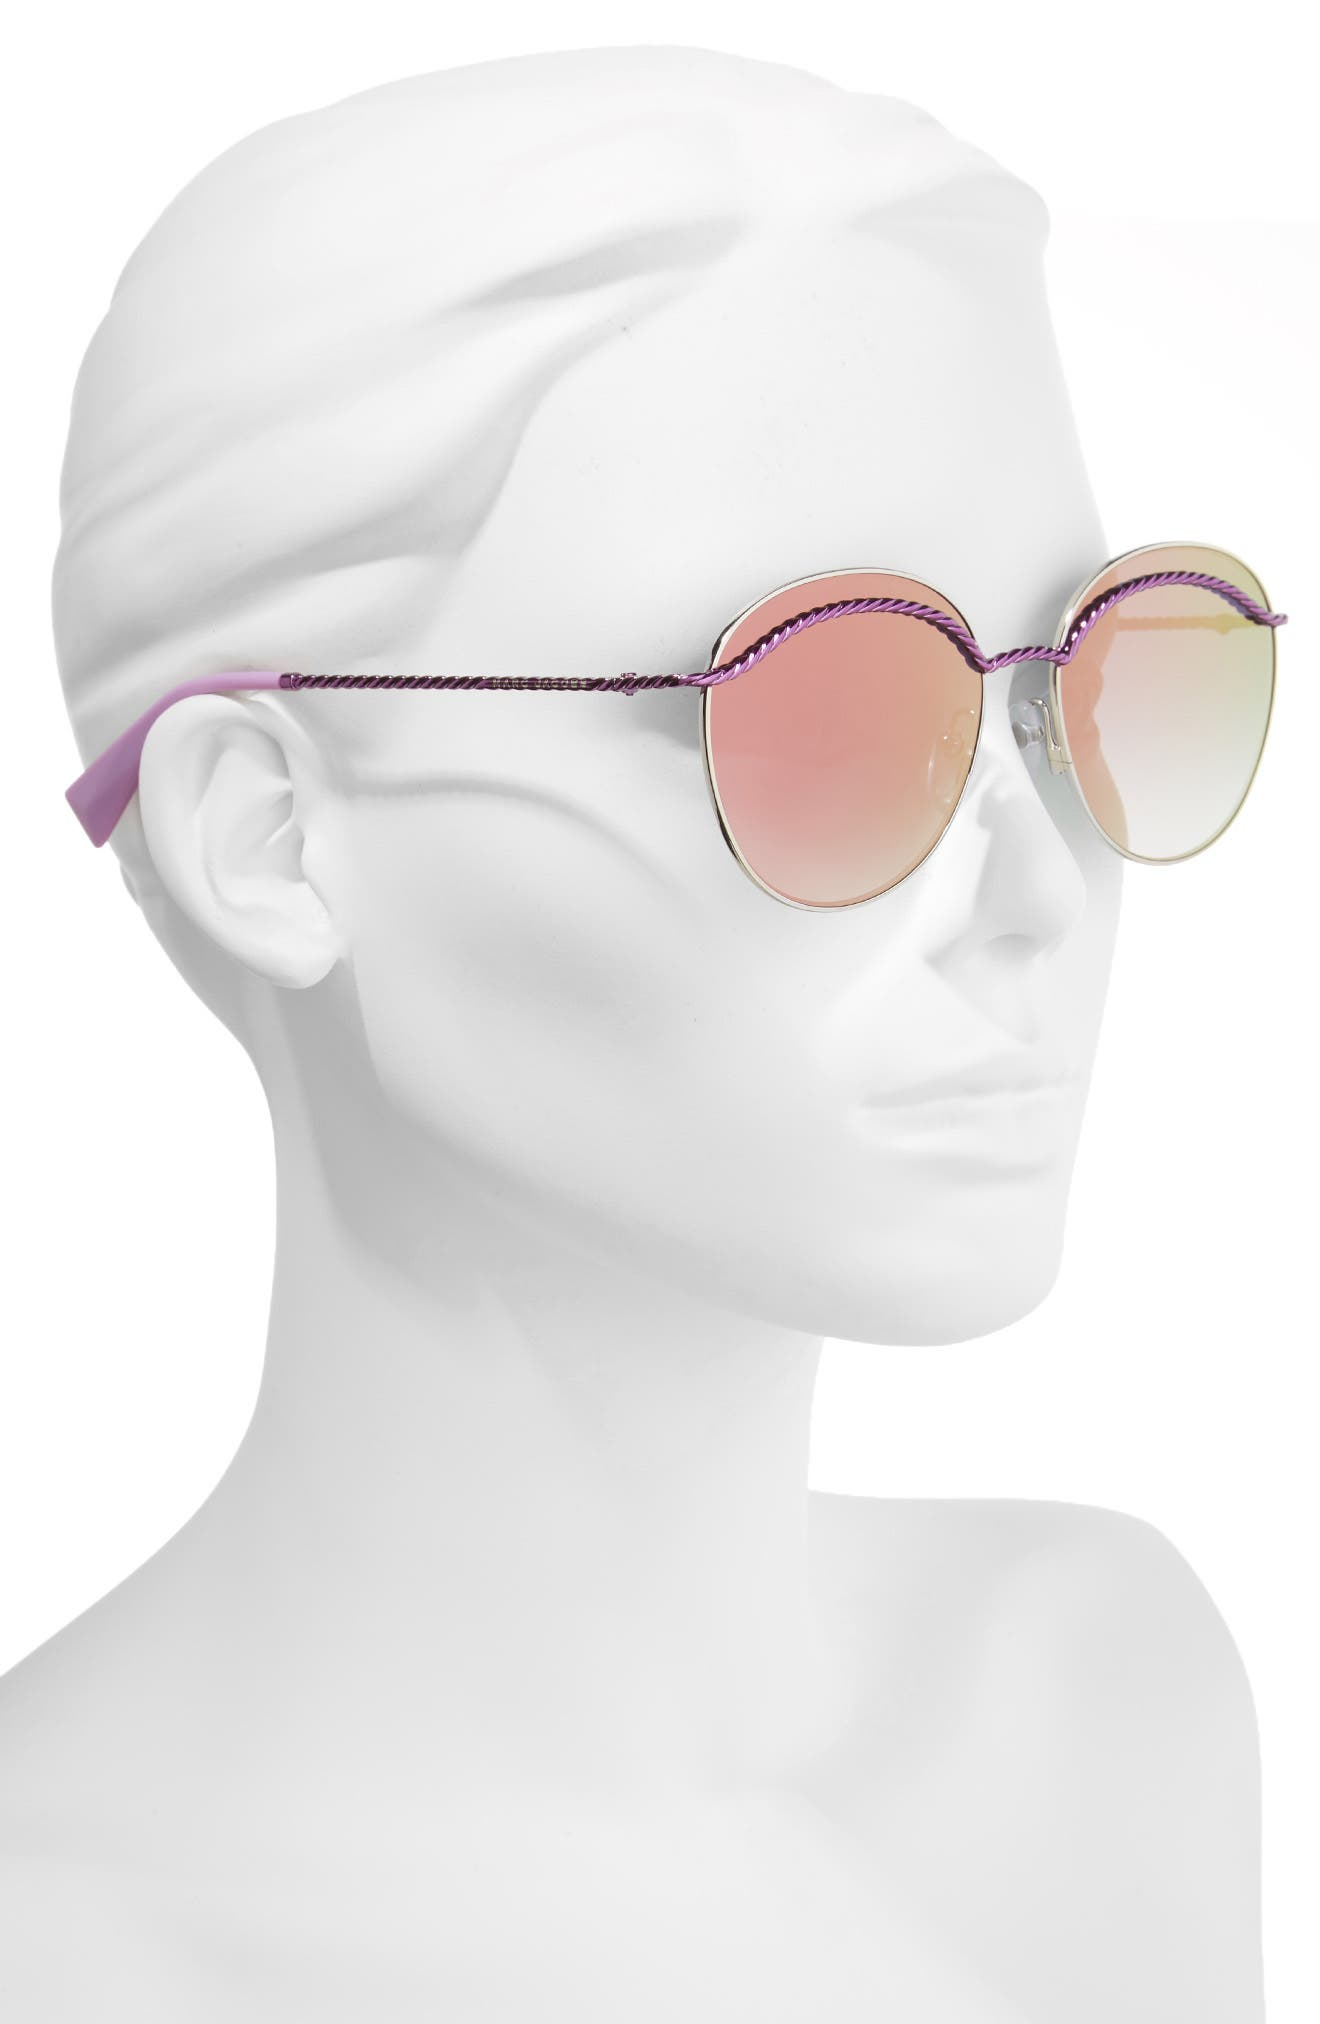 58mm Round Sunglasses,                             Alternate thumbnail 2, color,                             MATTE MAGENTA